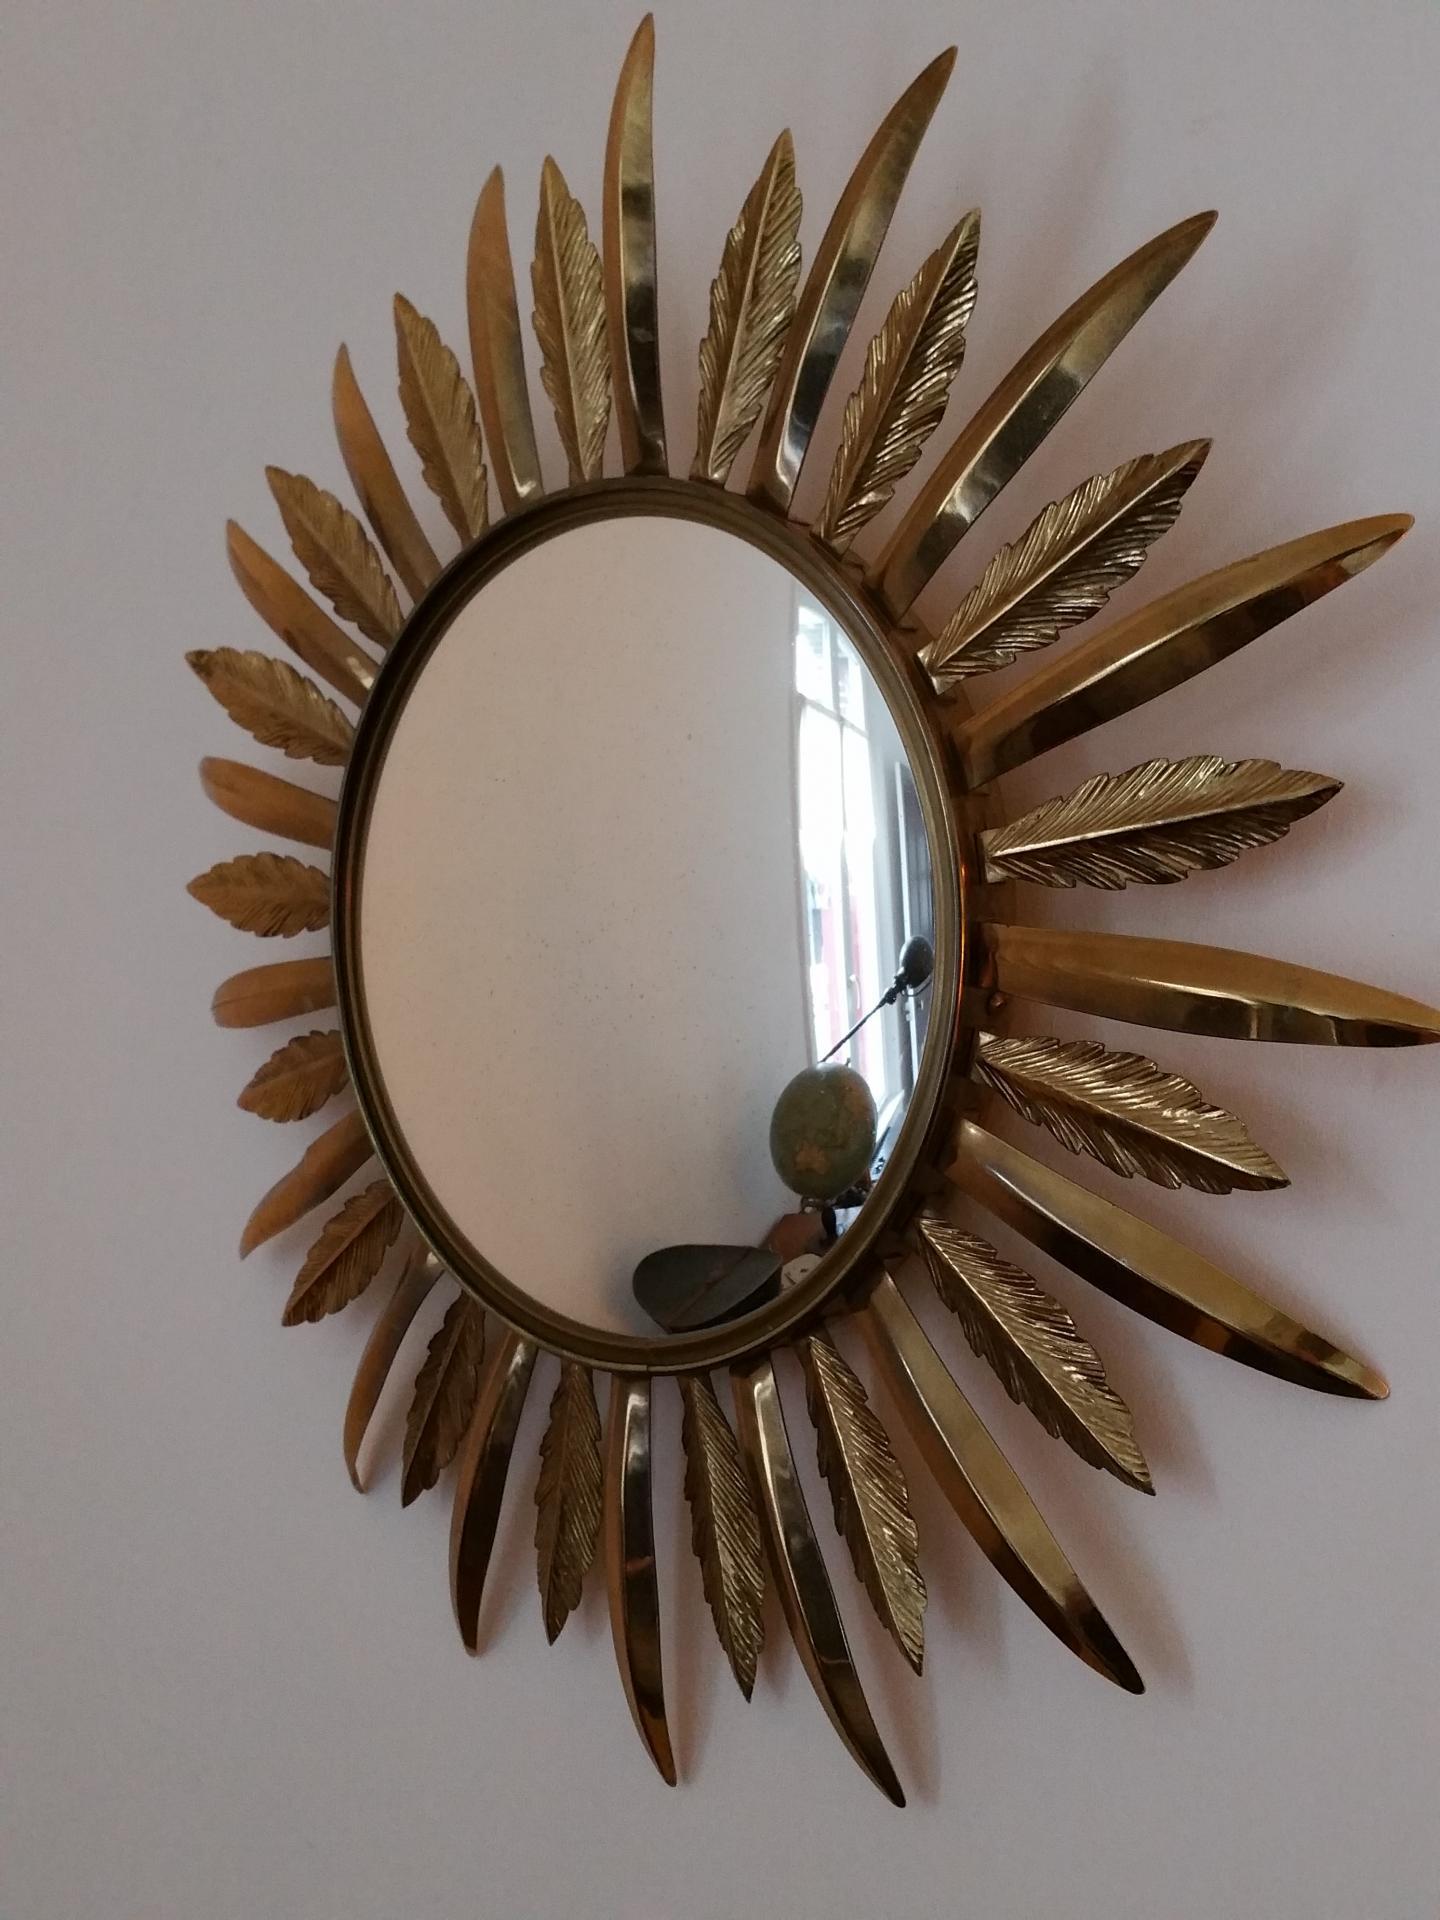 2 miroir soleil